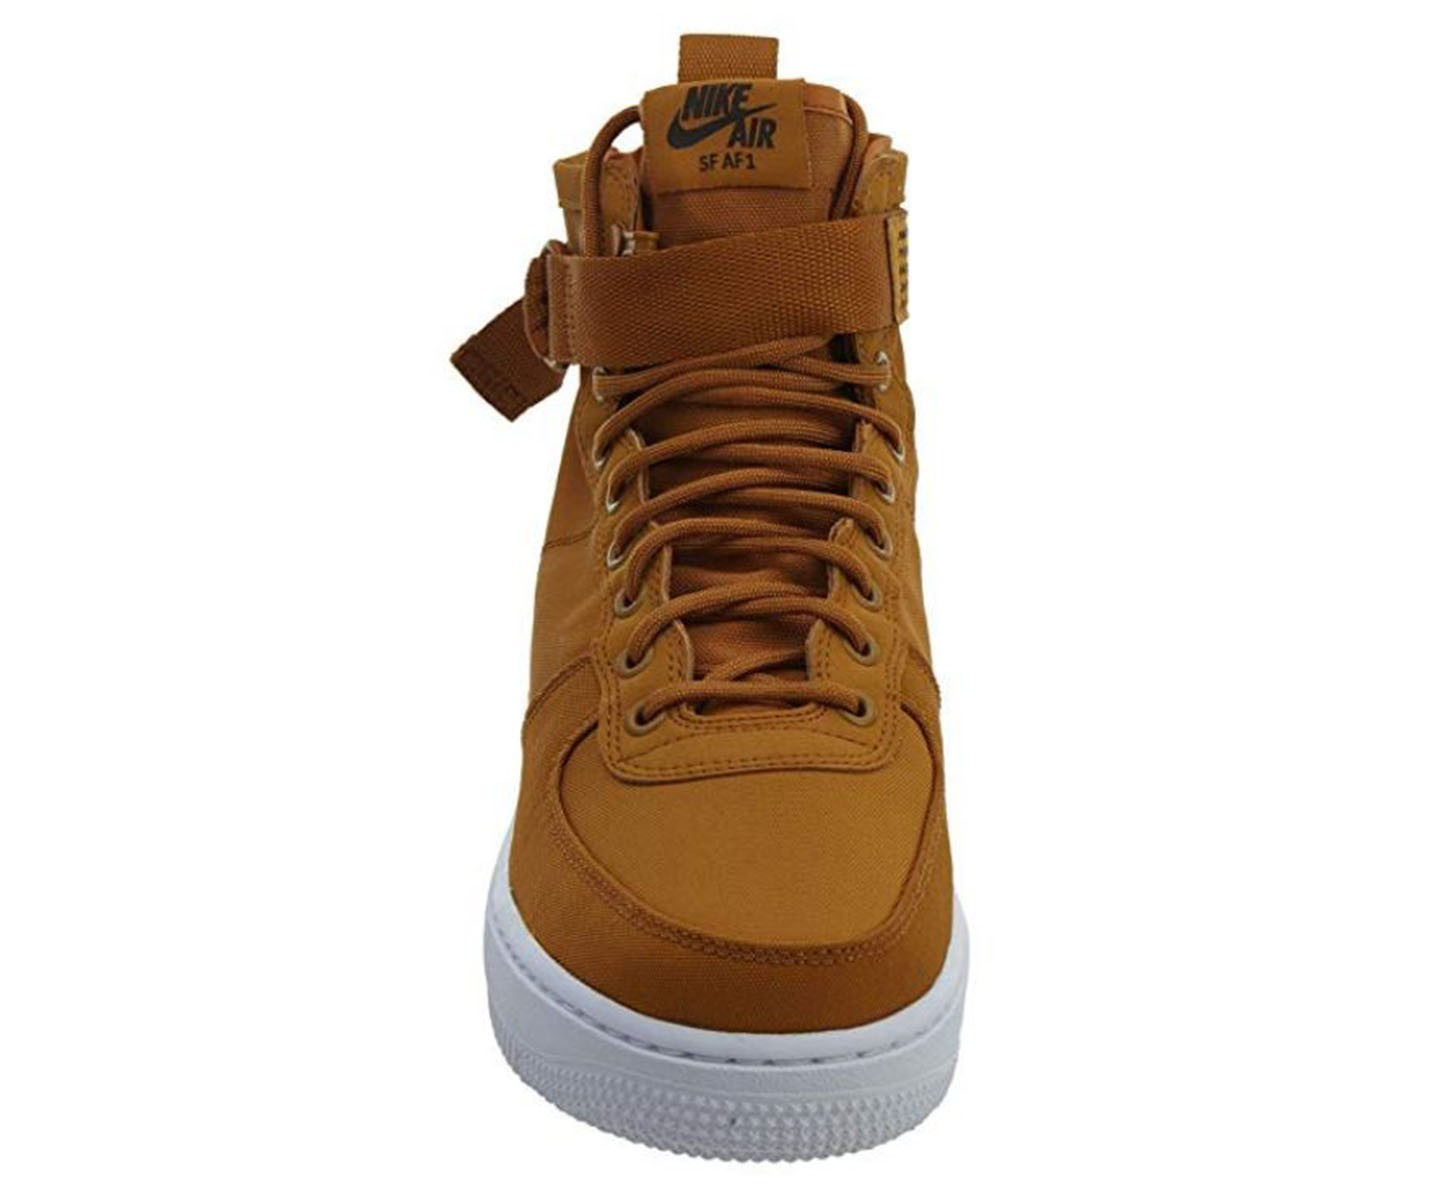 factory authentic f6d2b 208f5 Scarpe uomo sneakers NIKE SF AIR FORCE 1 in tessuto senape 917753-700 2 2  di 3 ...